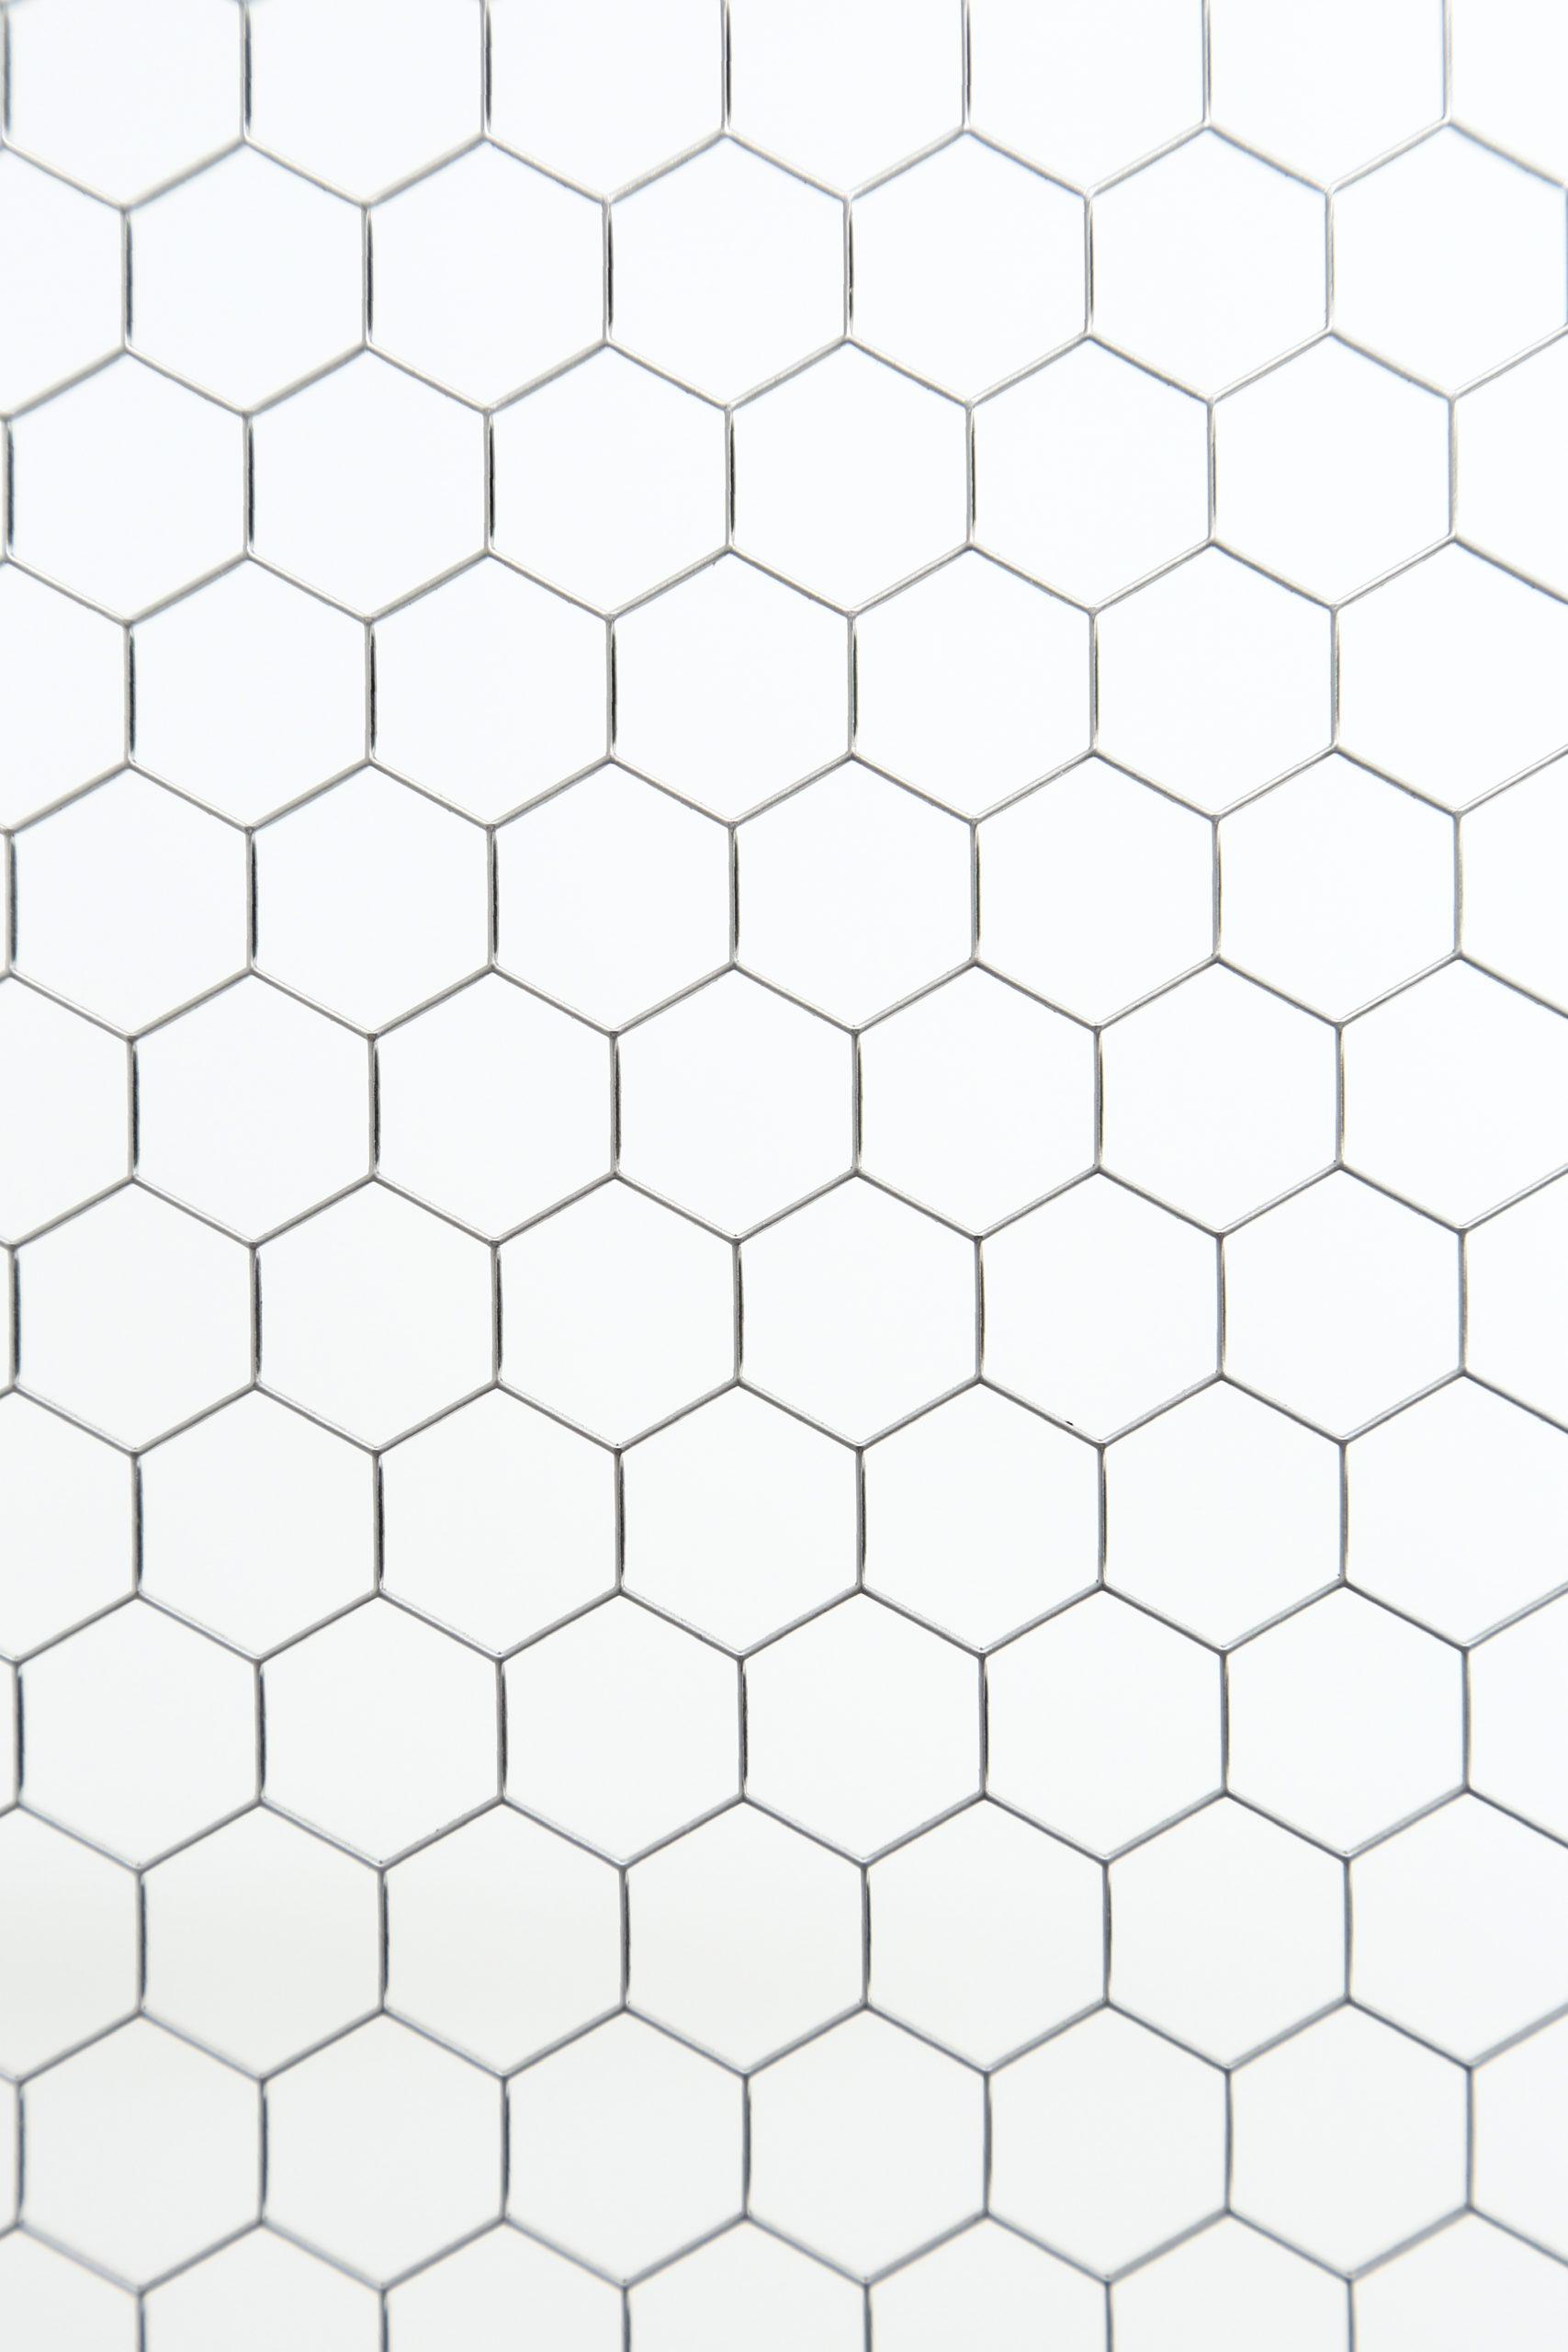 SUS 304-2B t1.0 六角形 W15×P15.5 60°チドリ 開口率:93.7%